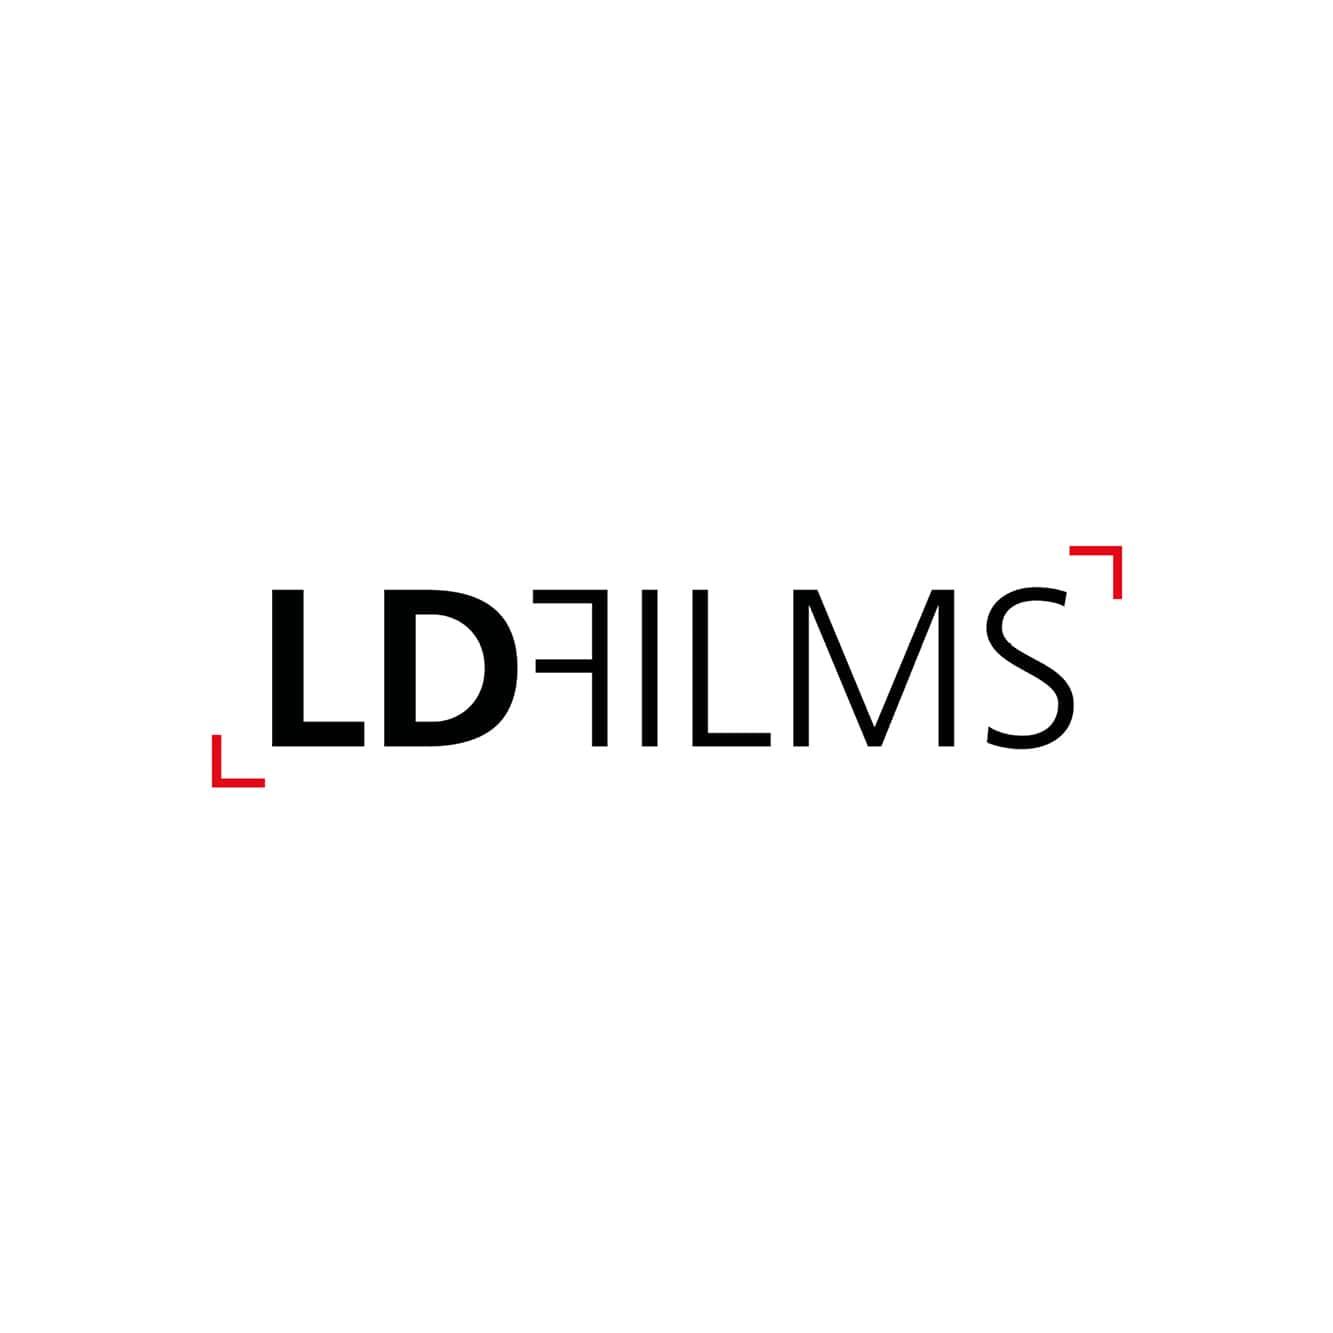 Hermann_Mayer_Projekte_LD_FILMS_2